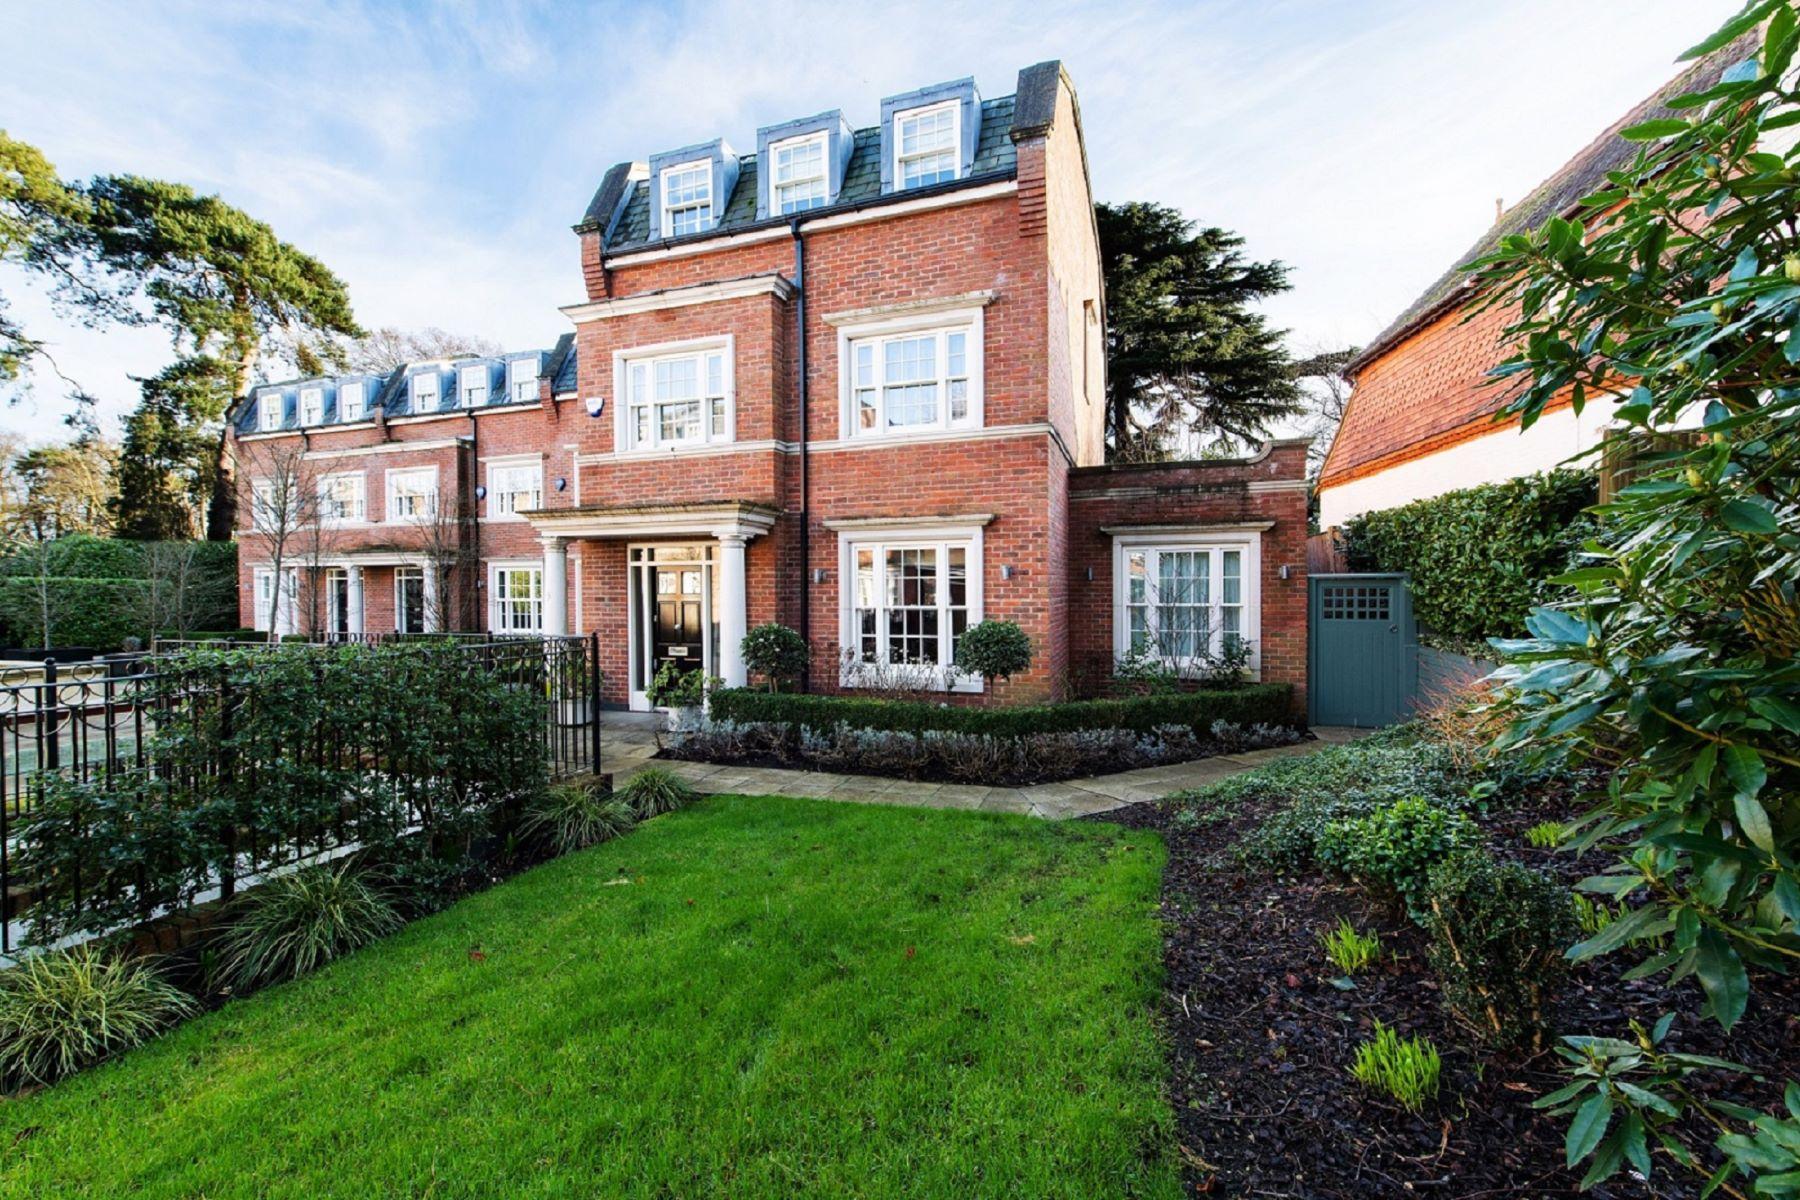 townhouses for Sale at Belgrave House 5 Warrenhurst Gardens Weybridge, England KT13 0EJ United Kingdom